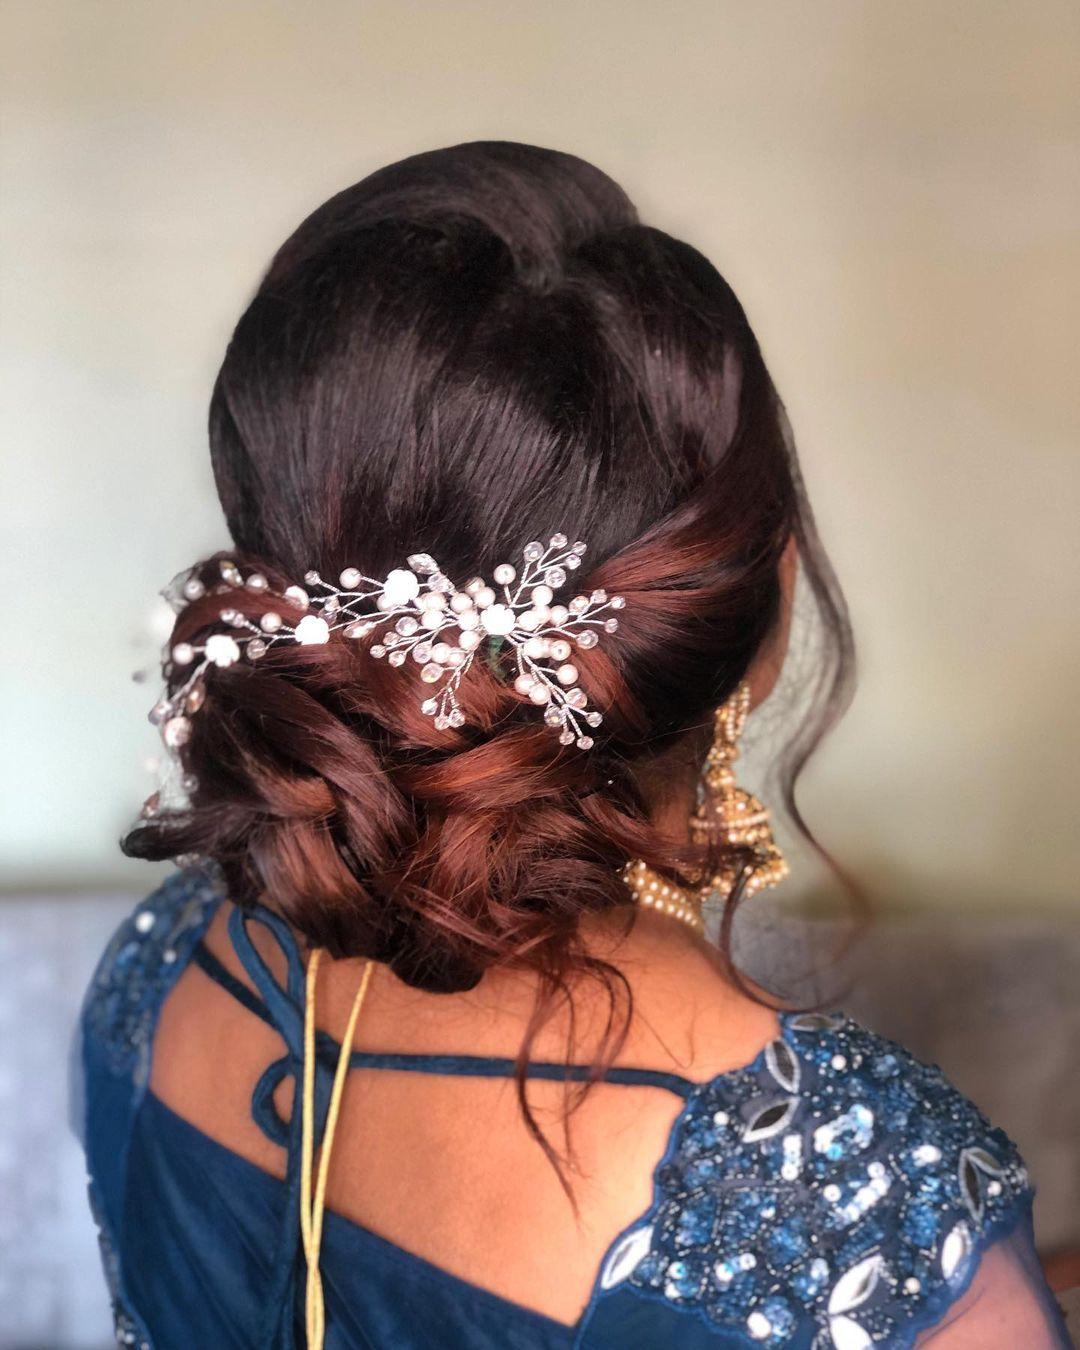 Hair bun with accessories